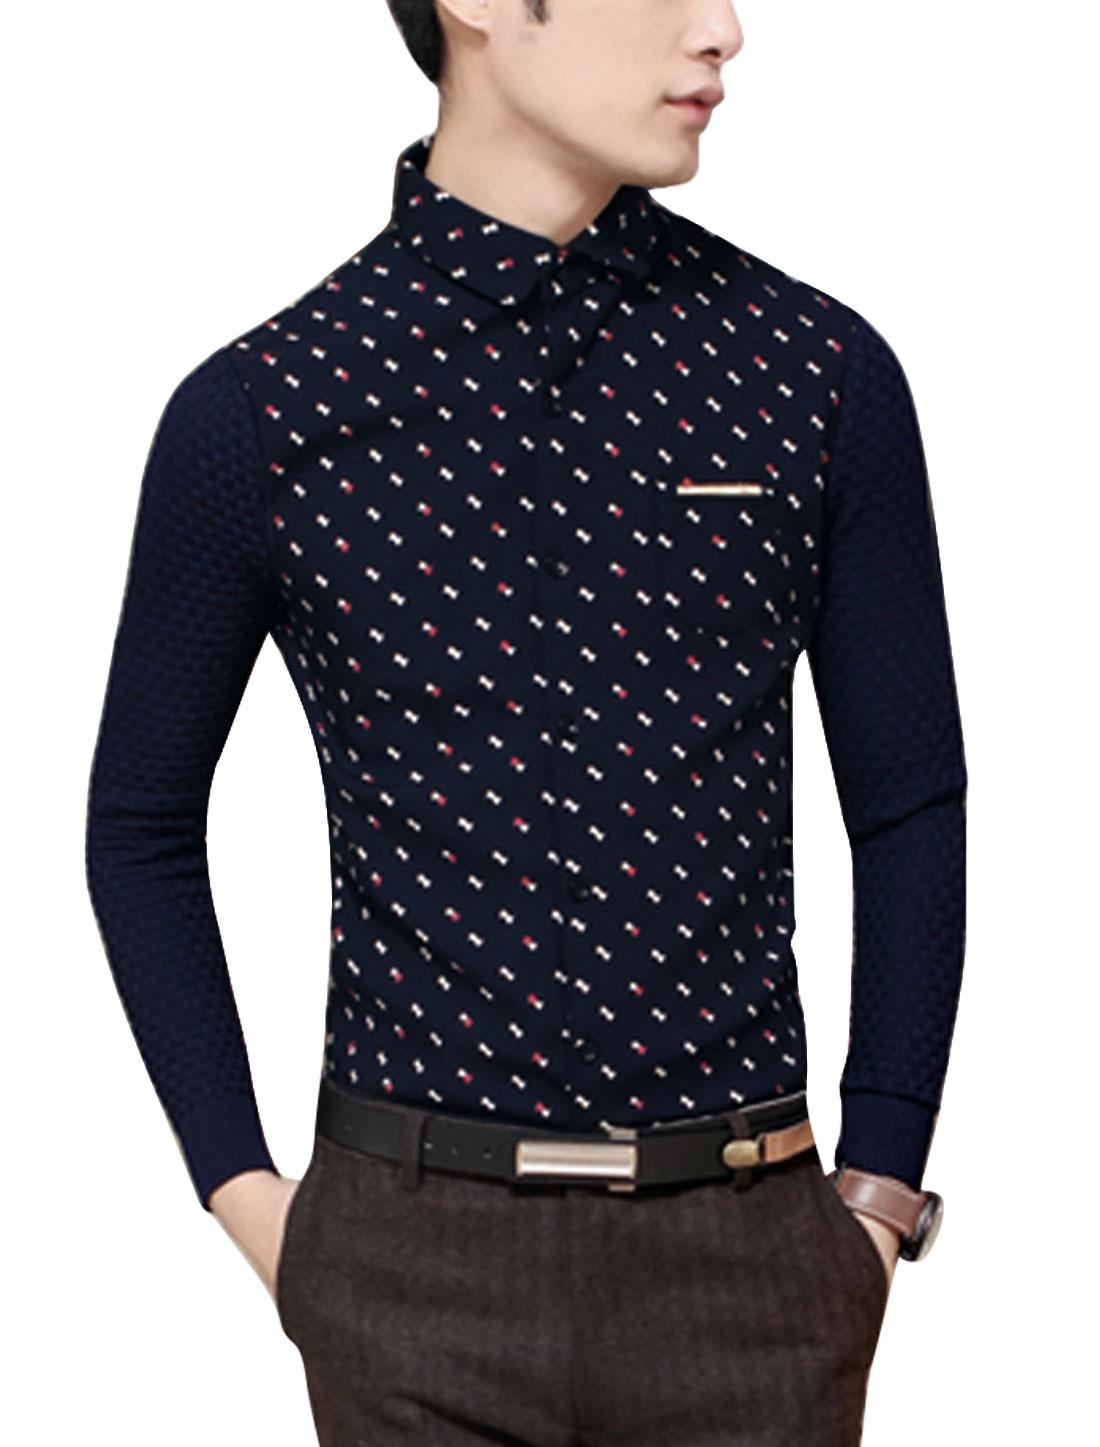 Men Bowknot Print Contrast Color Rib Knit Panel Slim Cut Shirt Navy Blue S